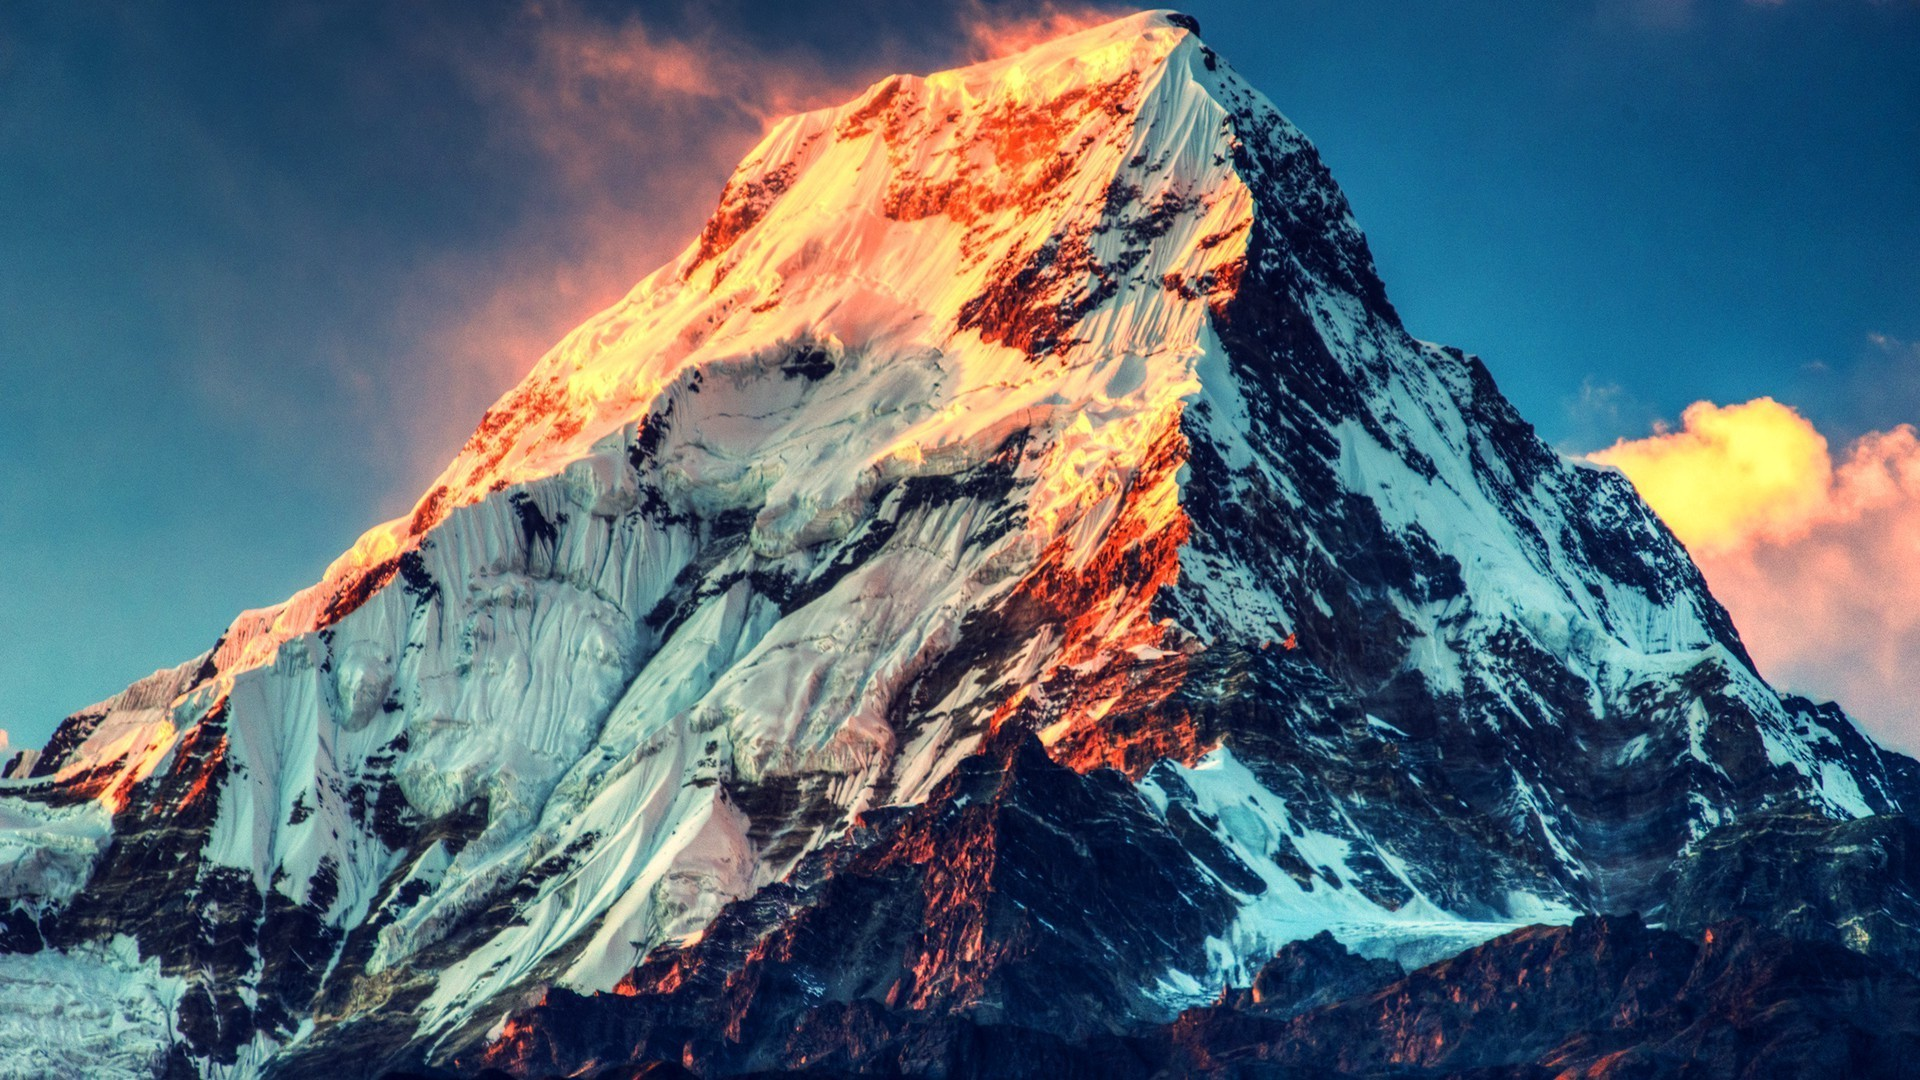 Mount Everest Wallpaper #2490